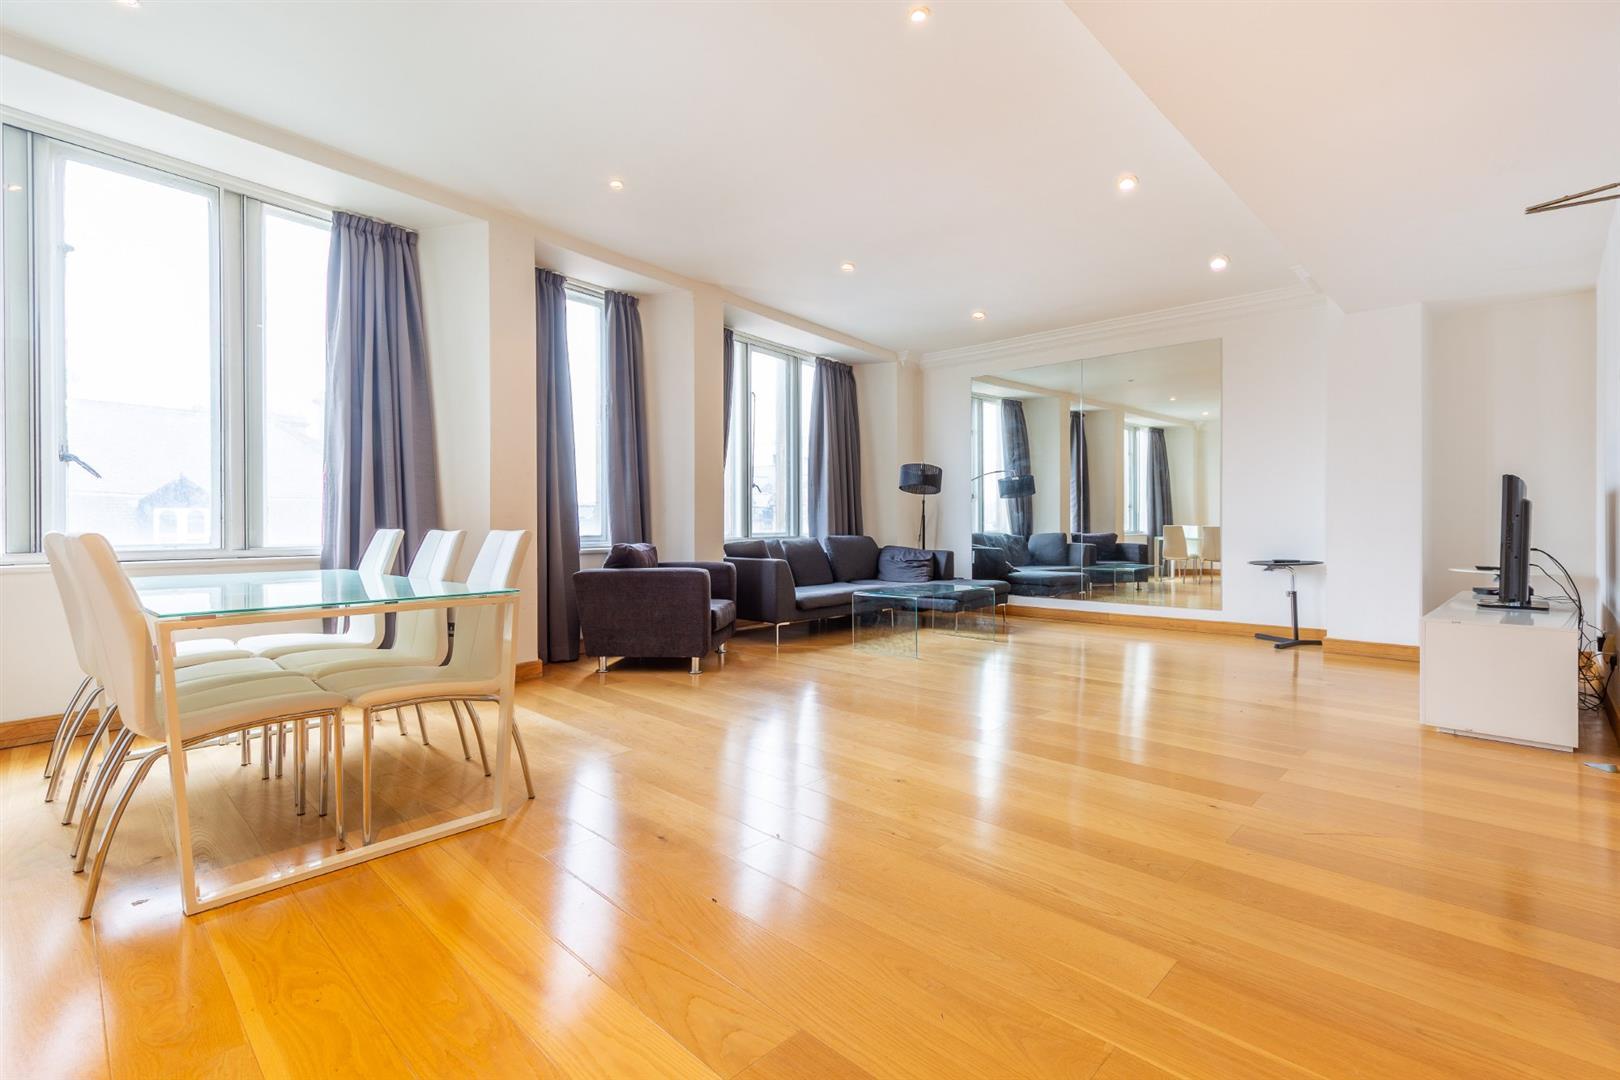 2 bed apartment to rent in City Centre, NE1 5JQ, NE1